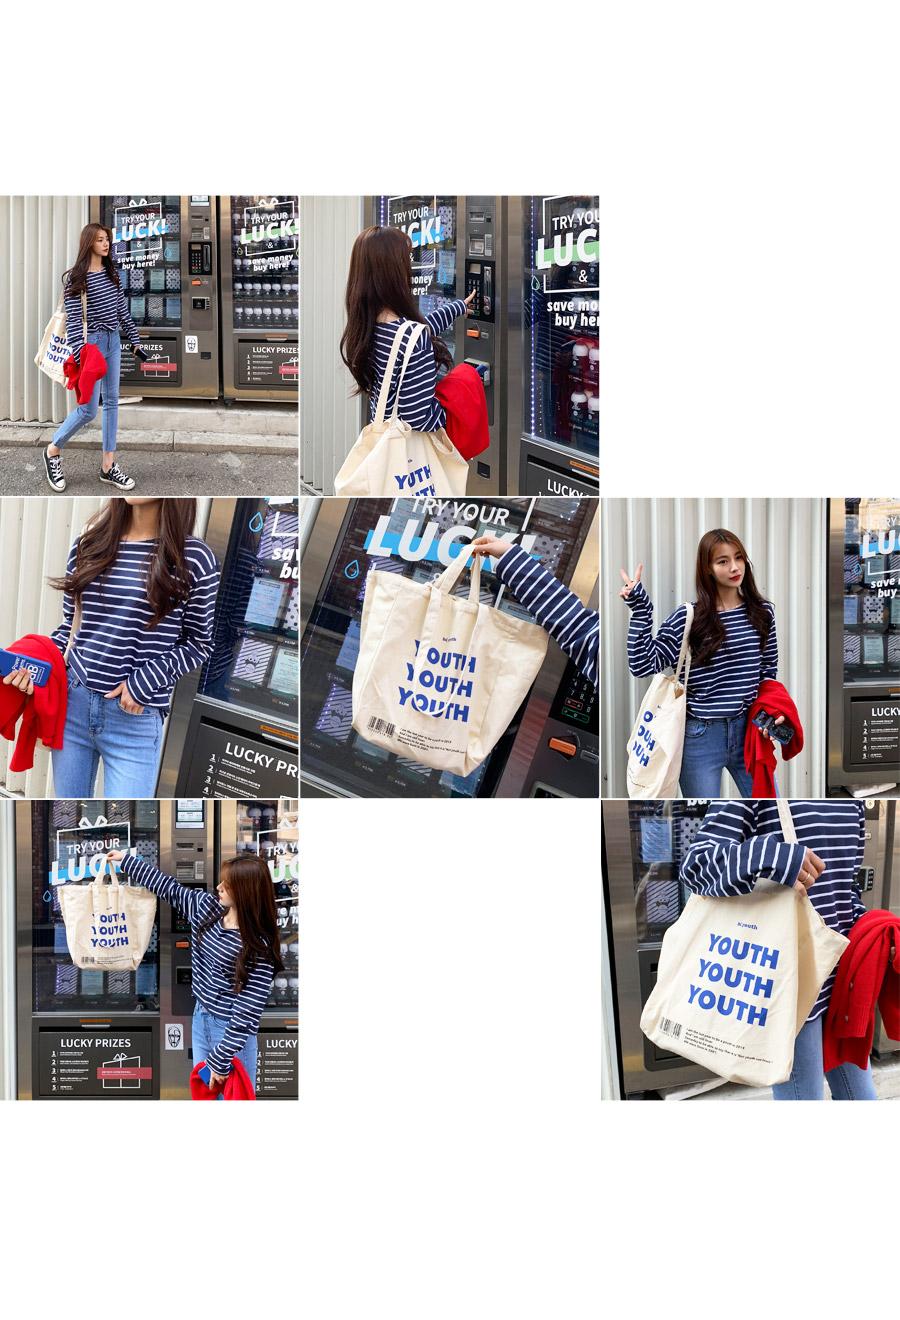 Youth Blue Eco Bag